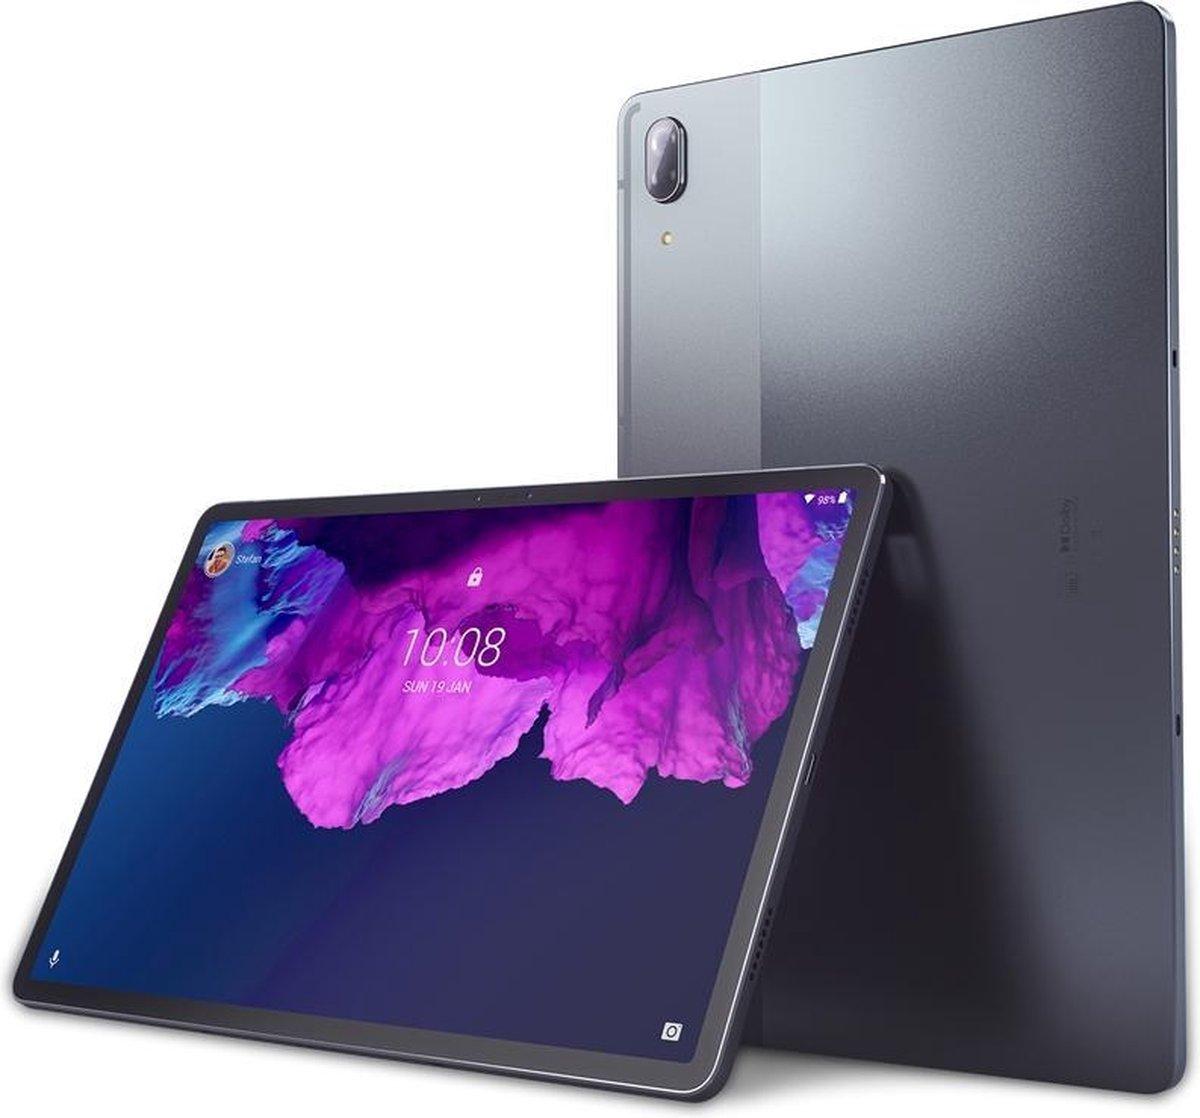 Lenovo Tab P11 Pro – 128 GB – WiFi + 4G – QWERTY toetsenbord + Pen – Grijs